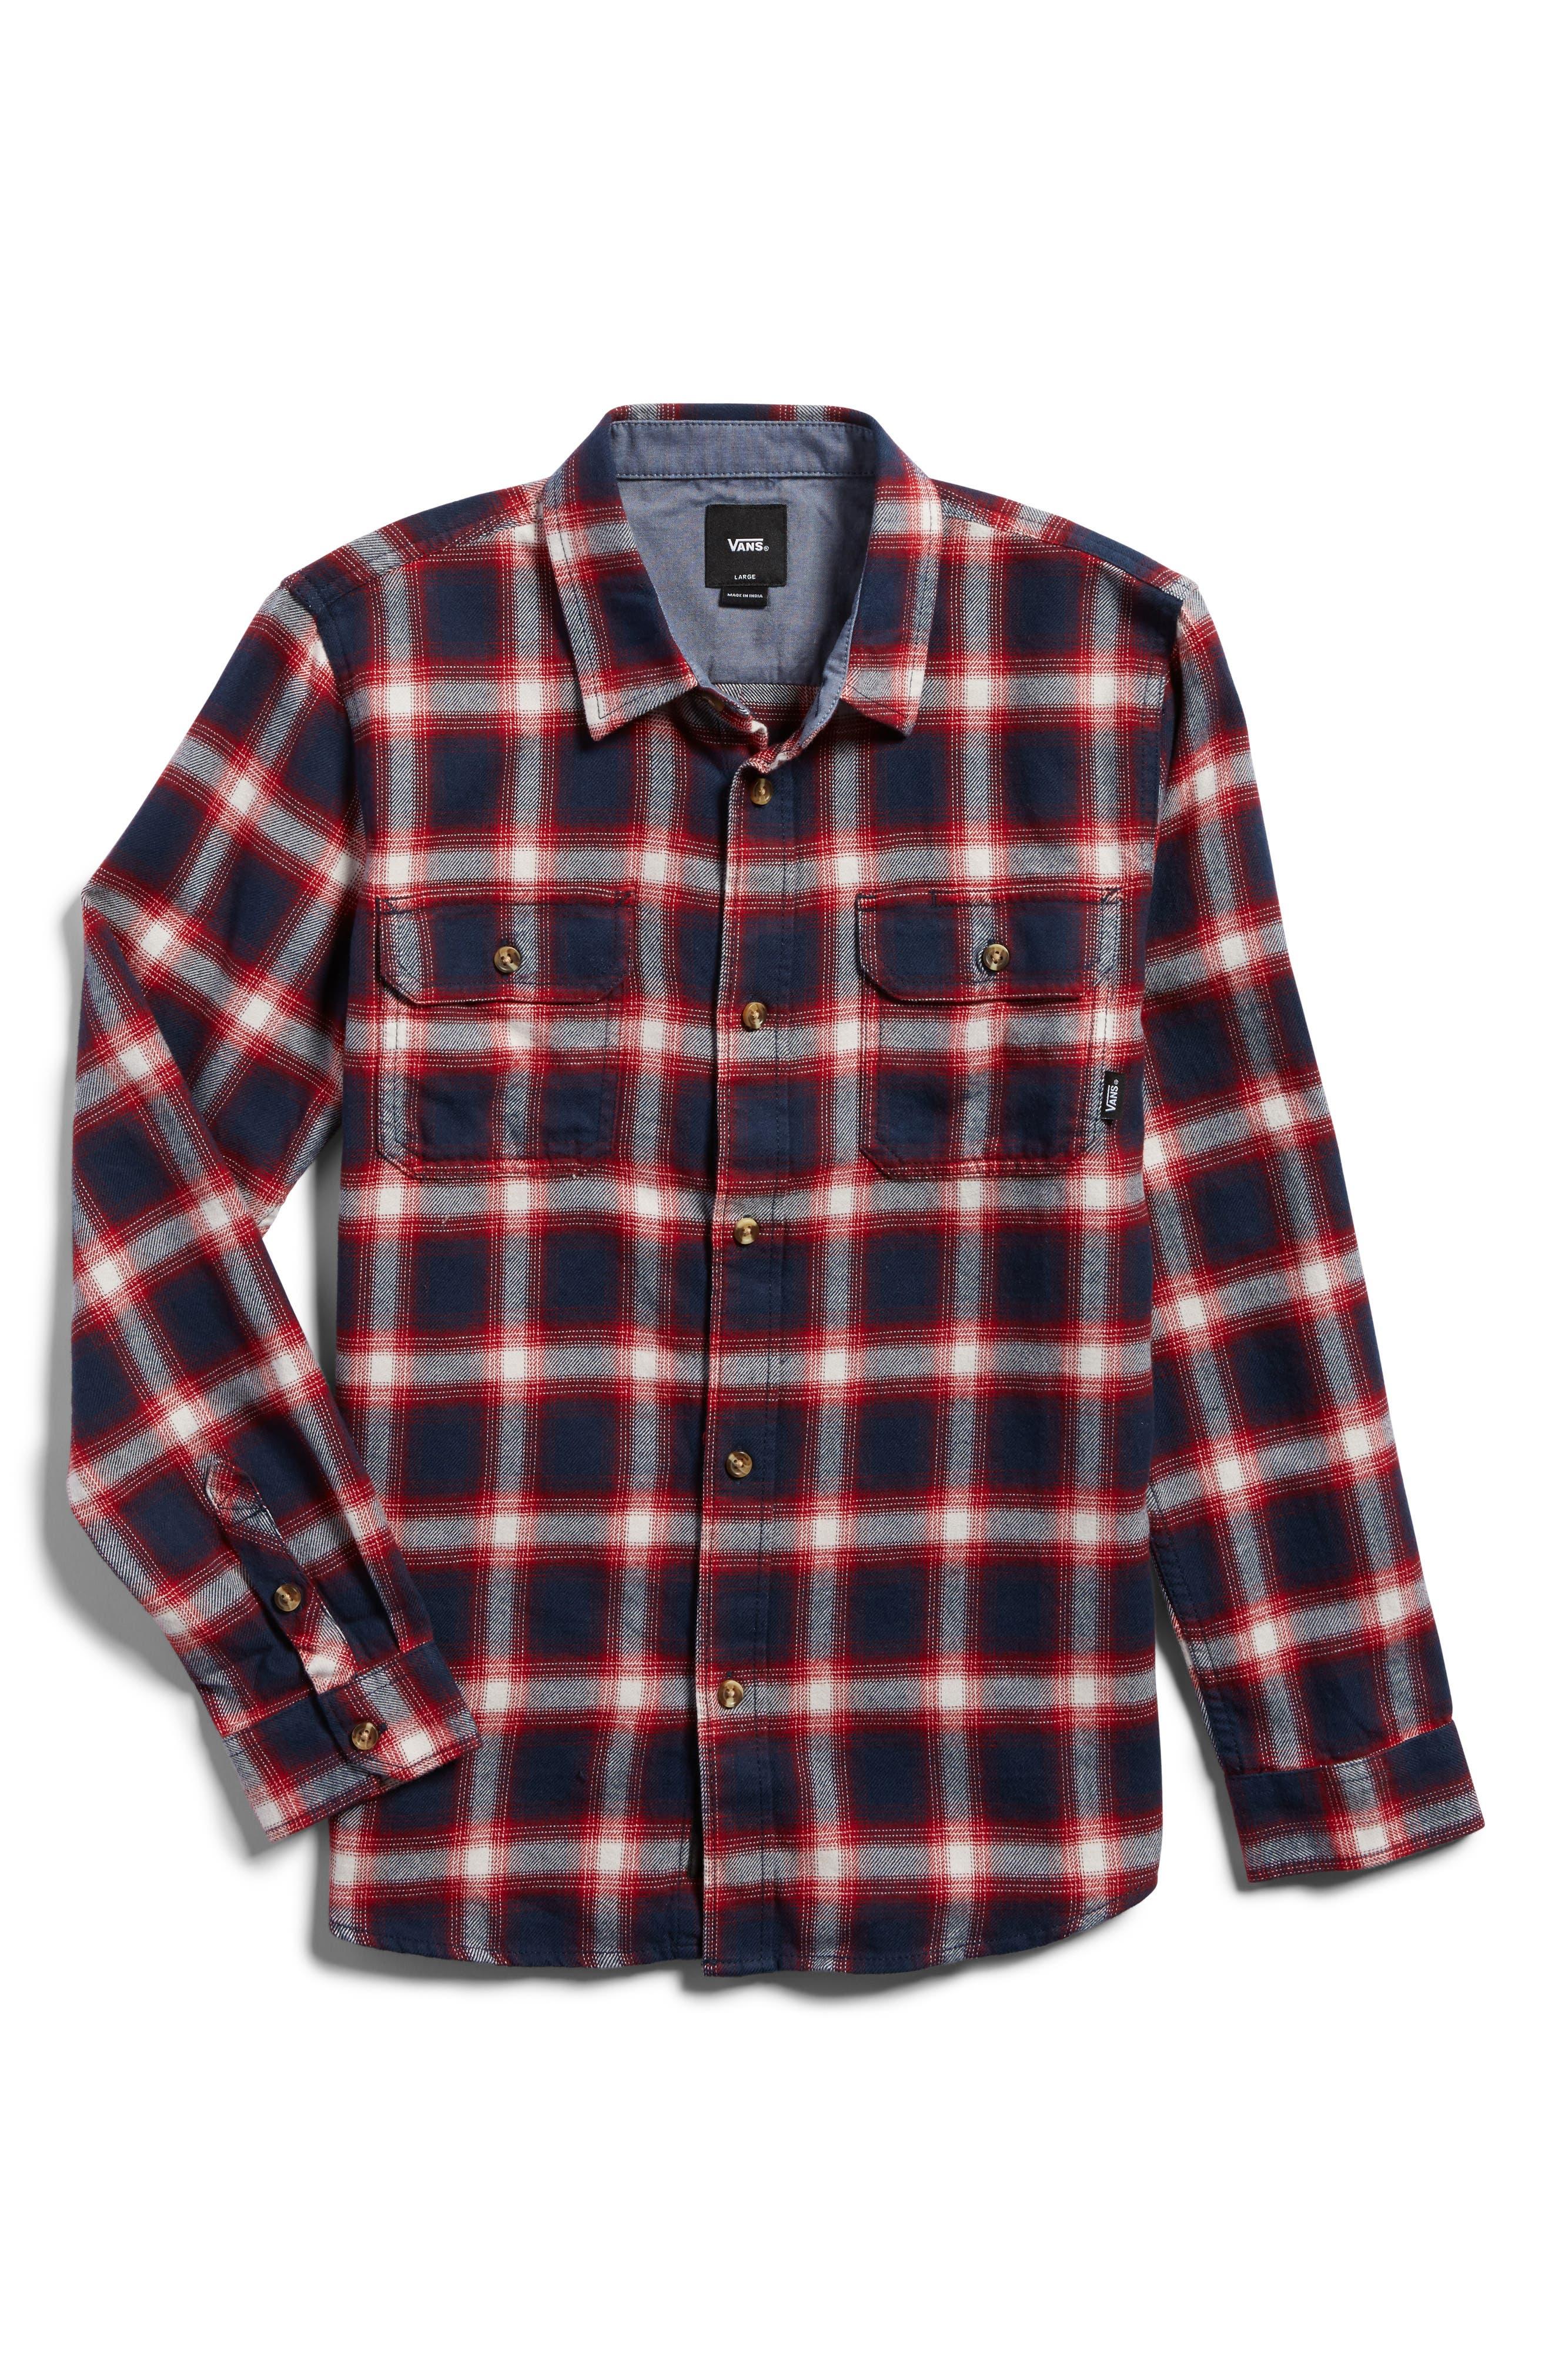 Main Image - Vans Beechwood Plaid Flannel Shirt (Big Boys)